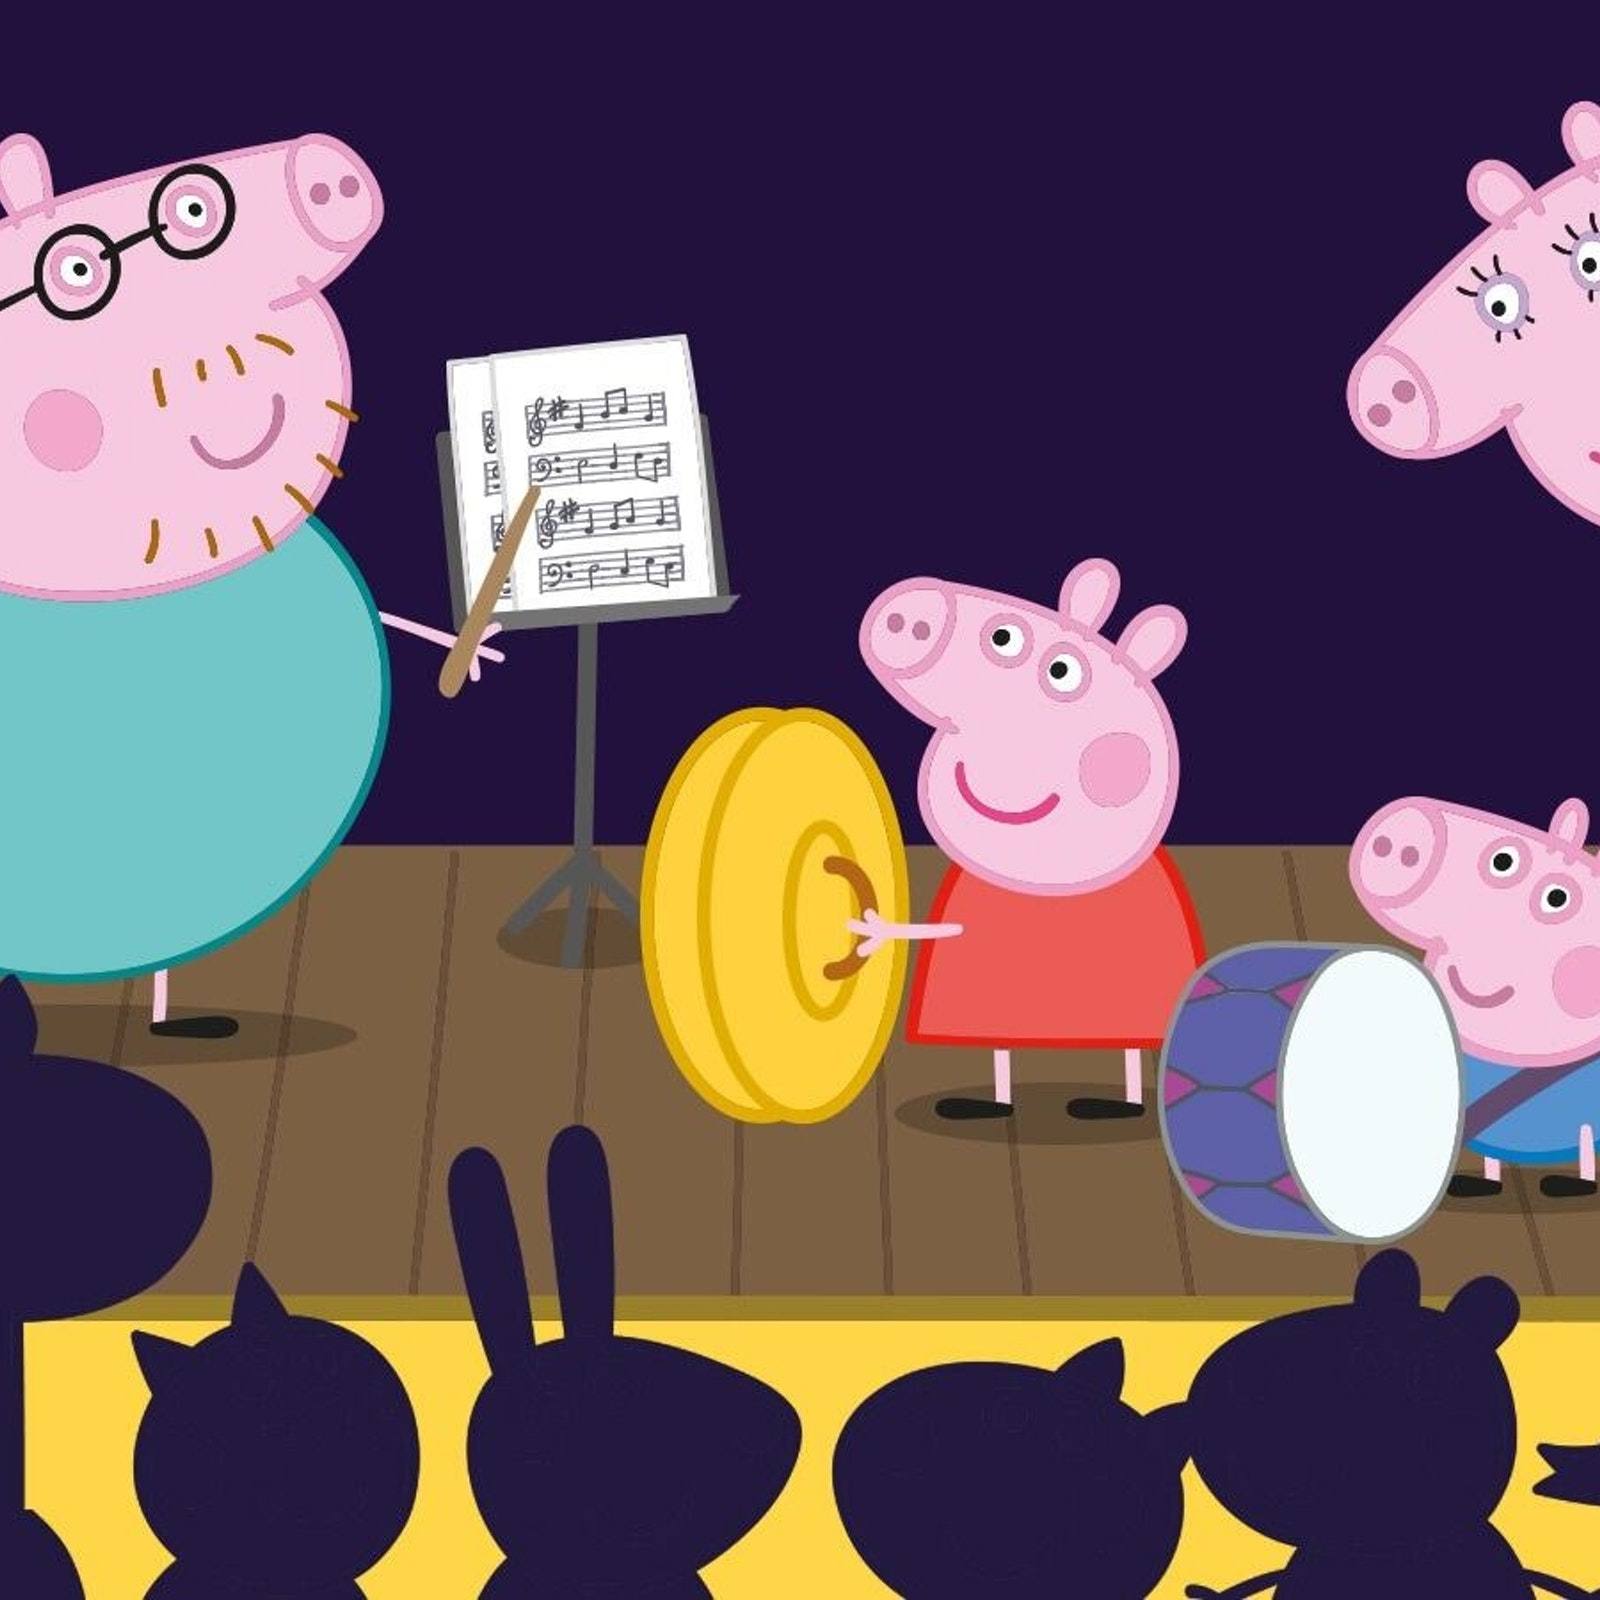 Peppa Pig Live Tour Dates Tickets 2019 Ents24